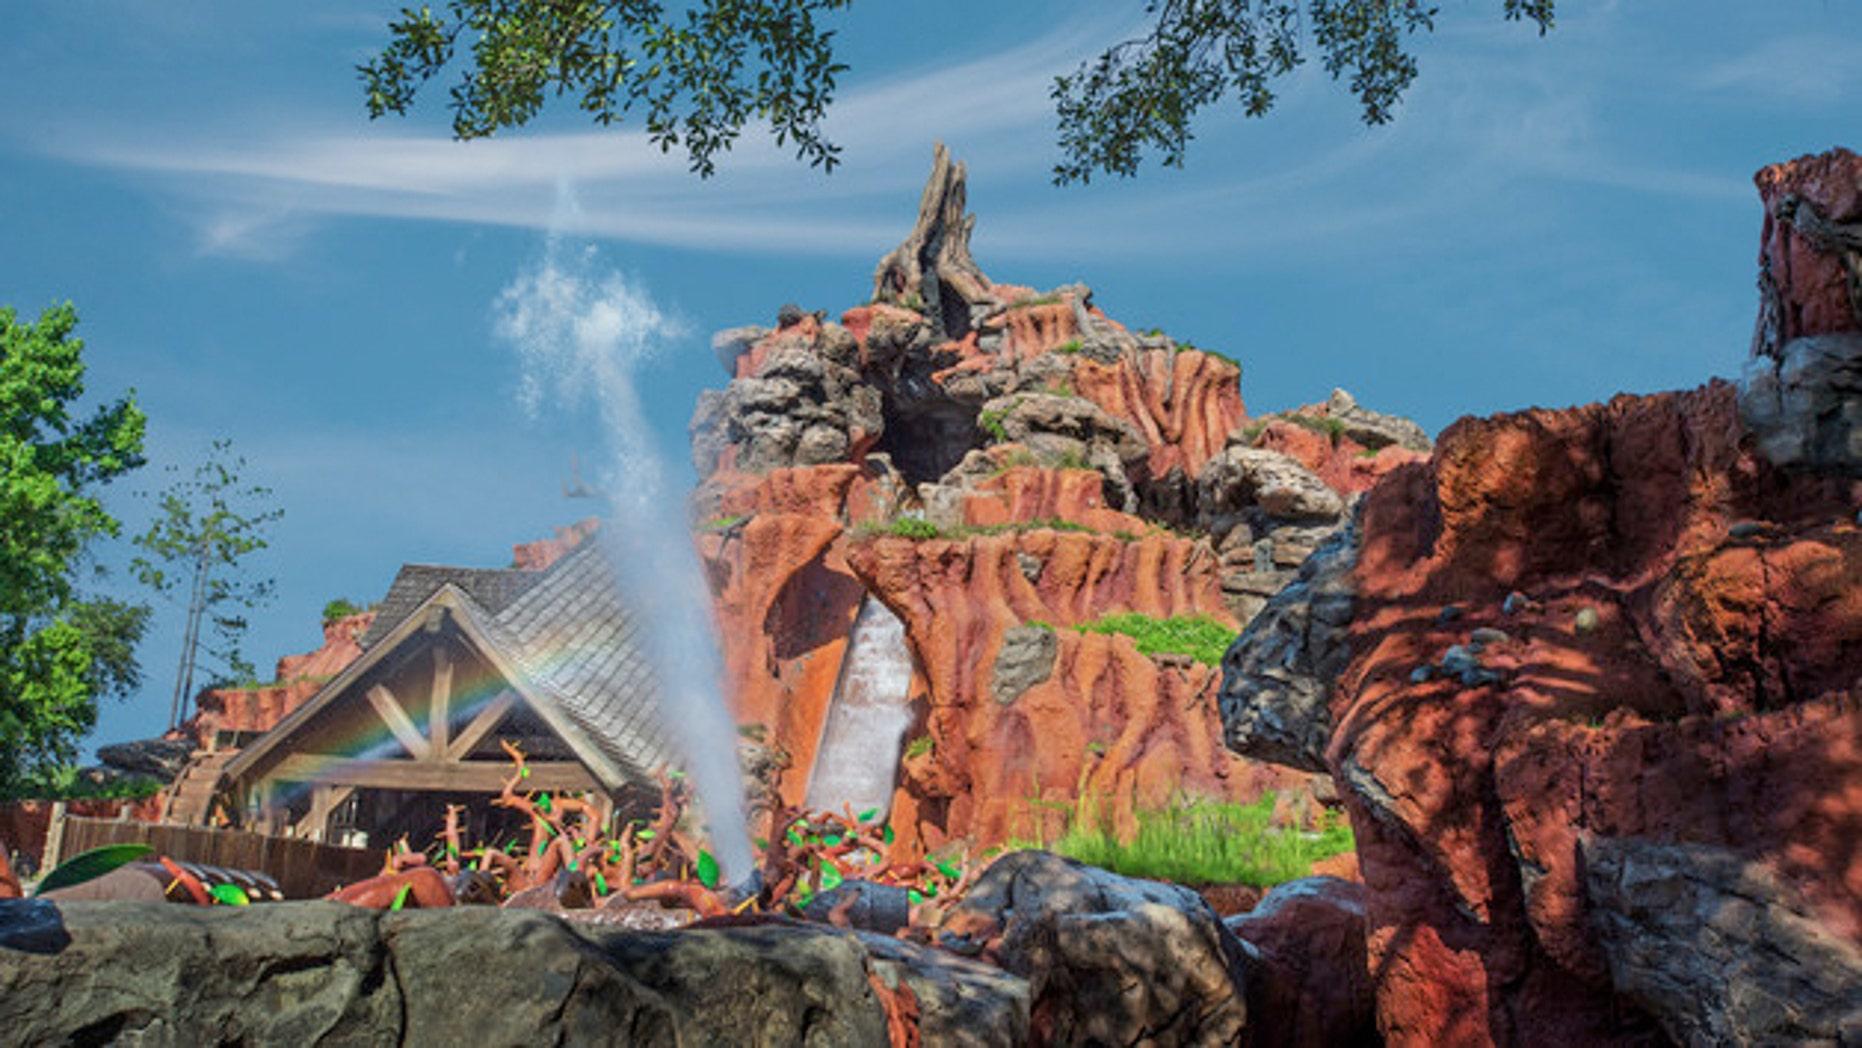 Disney's Splash Mountain located in Magic Kingdom in Walt Disney World in Orlando.